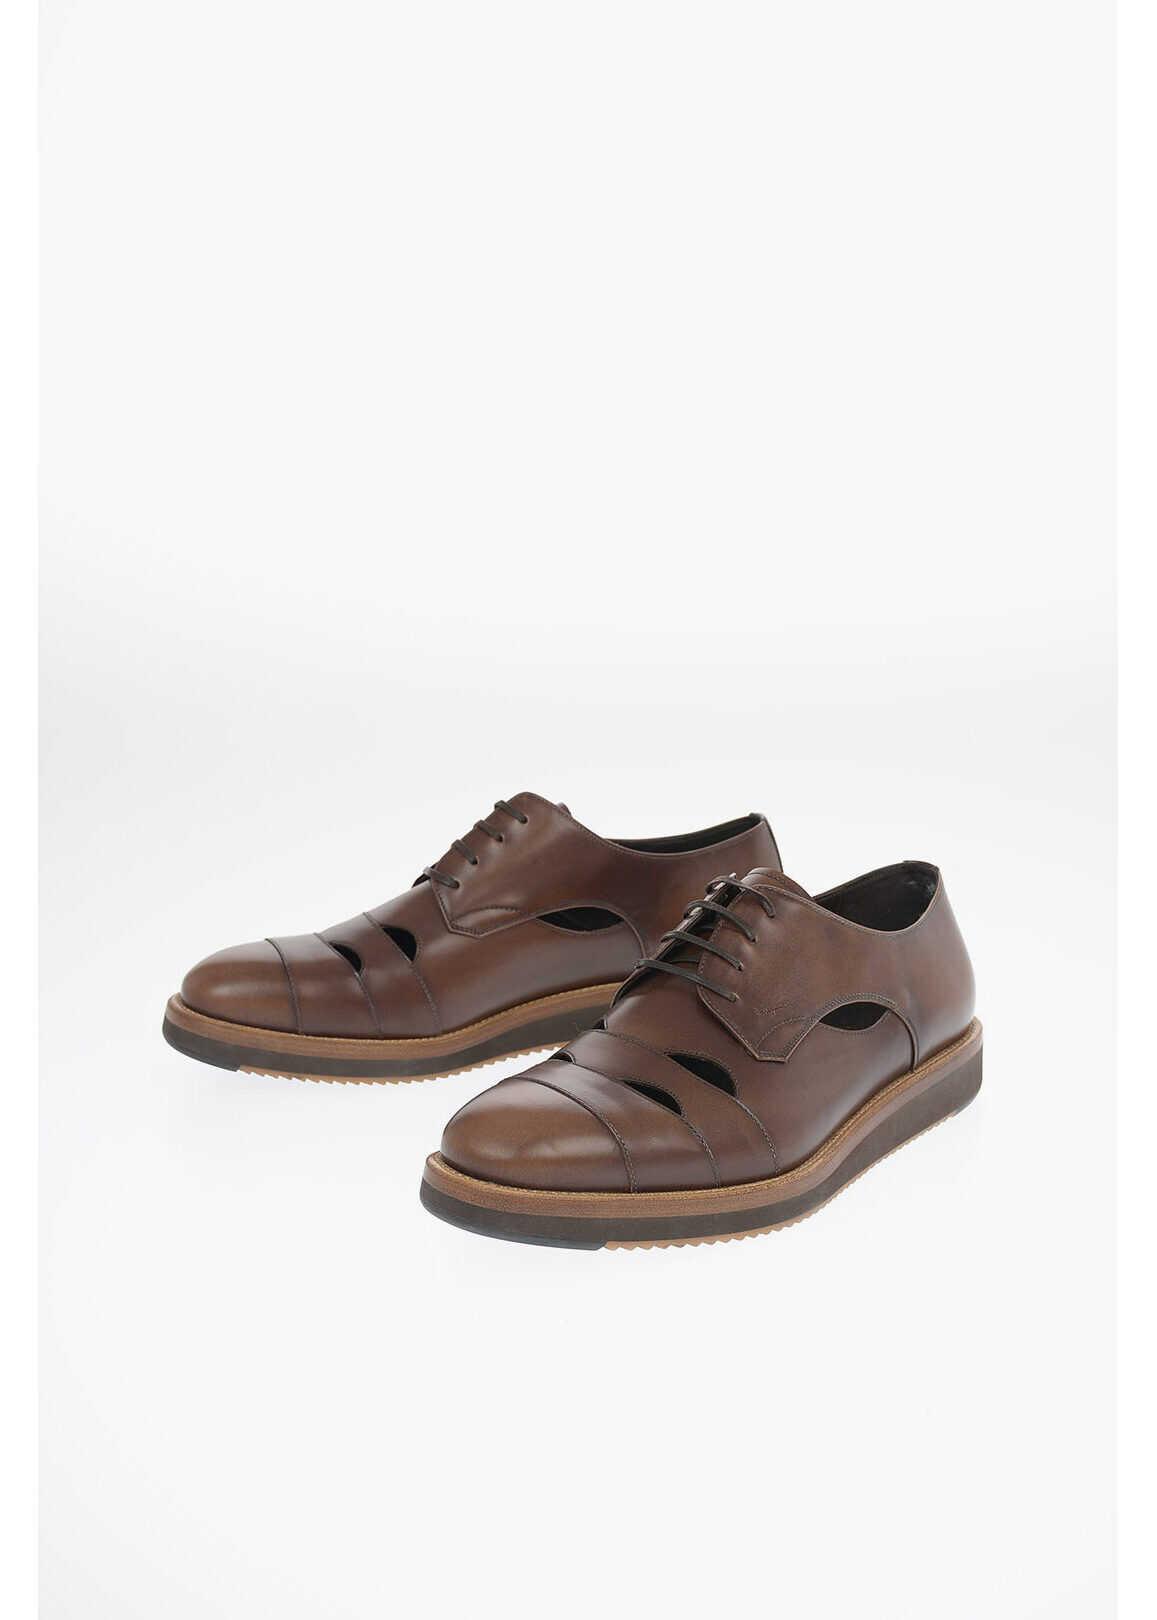 Salvatore Ferragamo Leather Unstructured FAMOSO Derby Shoes BROWN imagine b-mall.ro